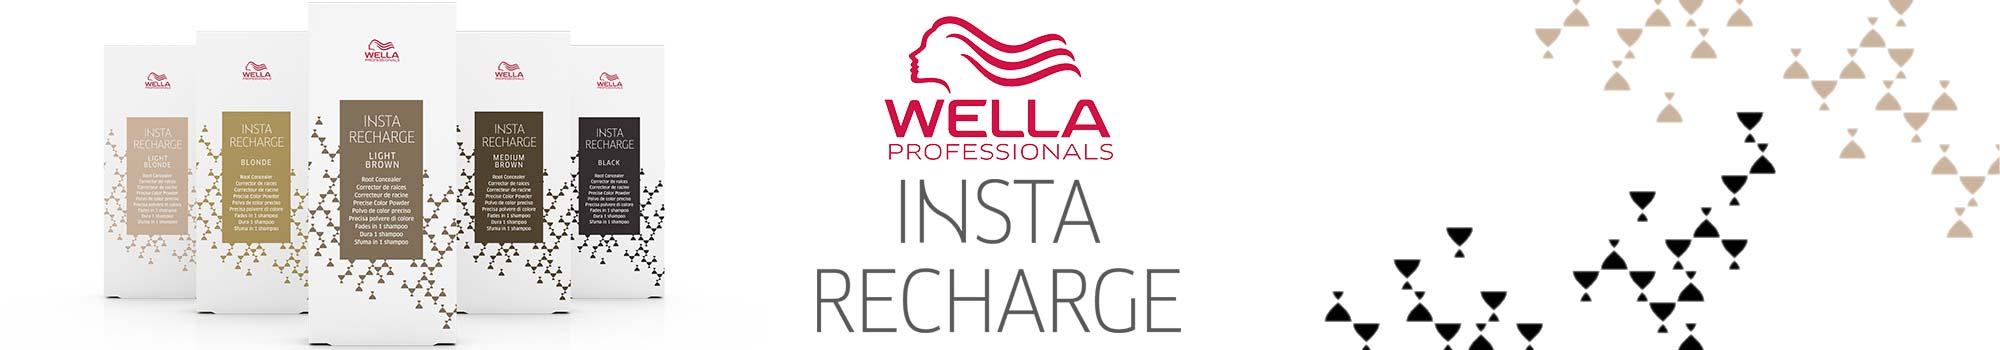 Wella Professionals Insta Recharge